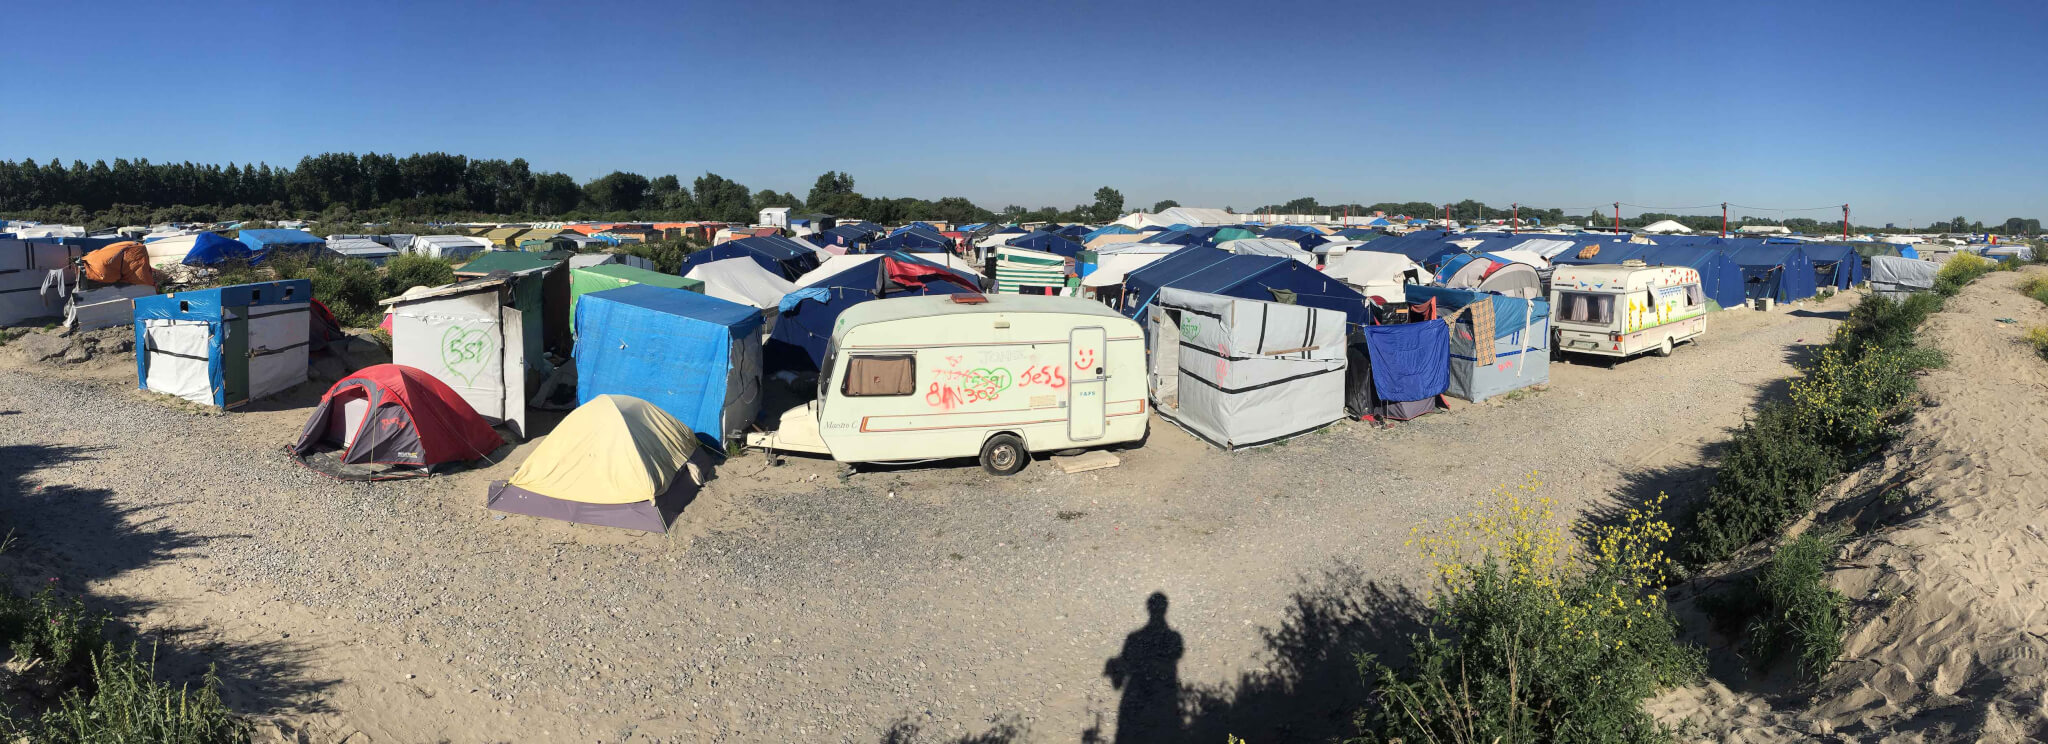 calais_camp_shelter_typologies_nasrchamma_bencekomlosi